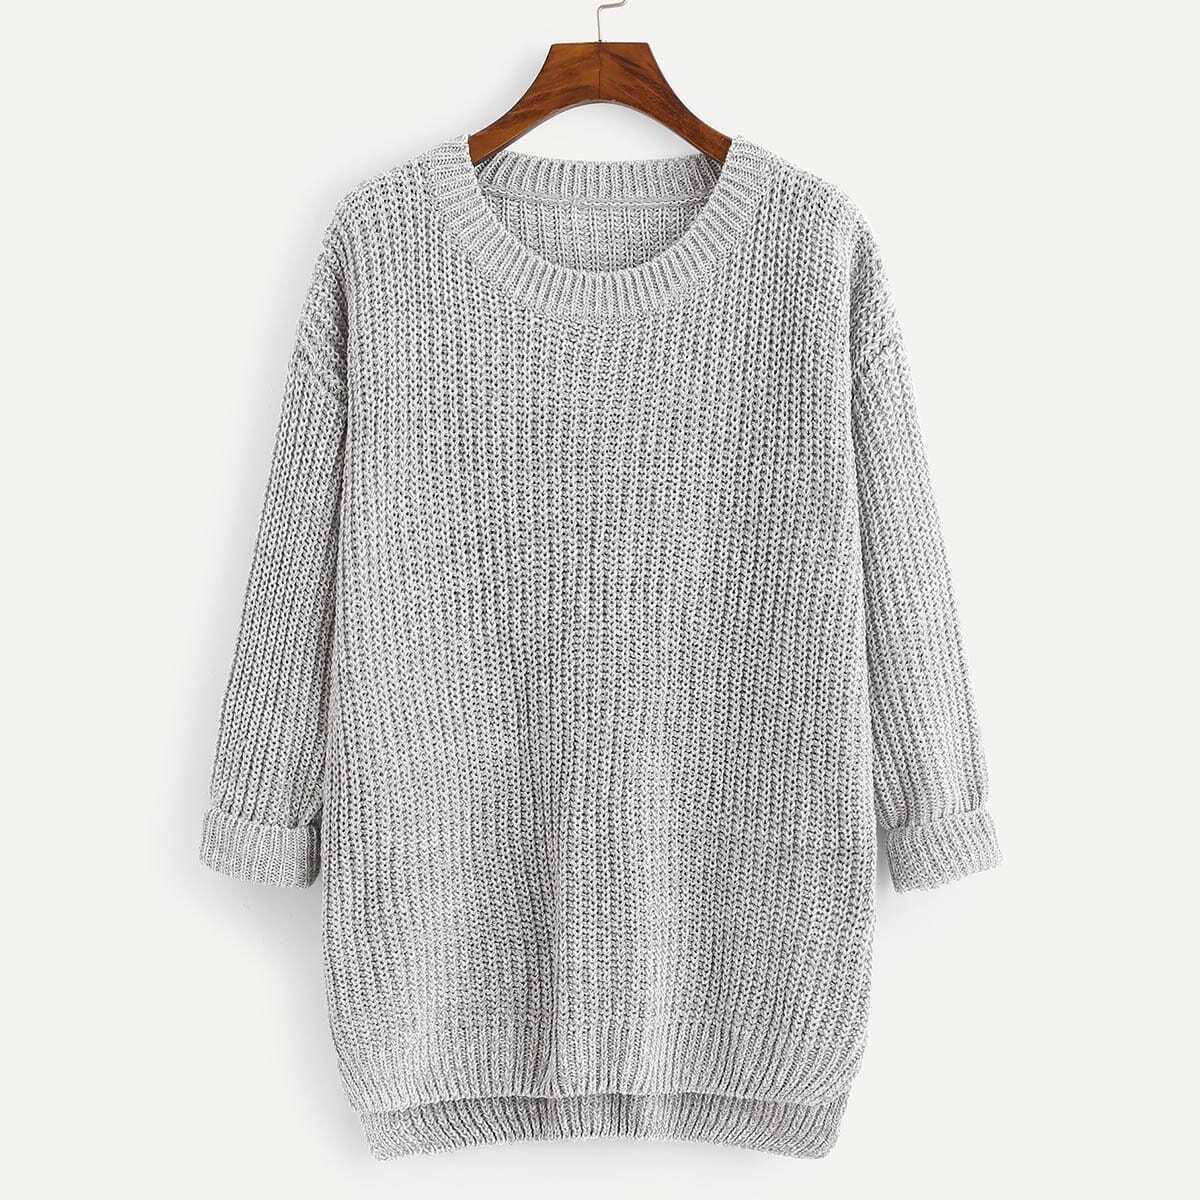 Grijze basic knit trui